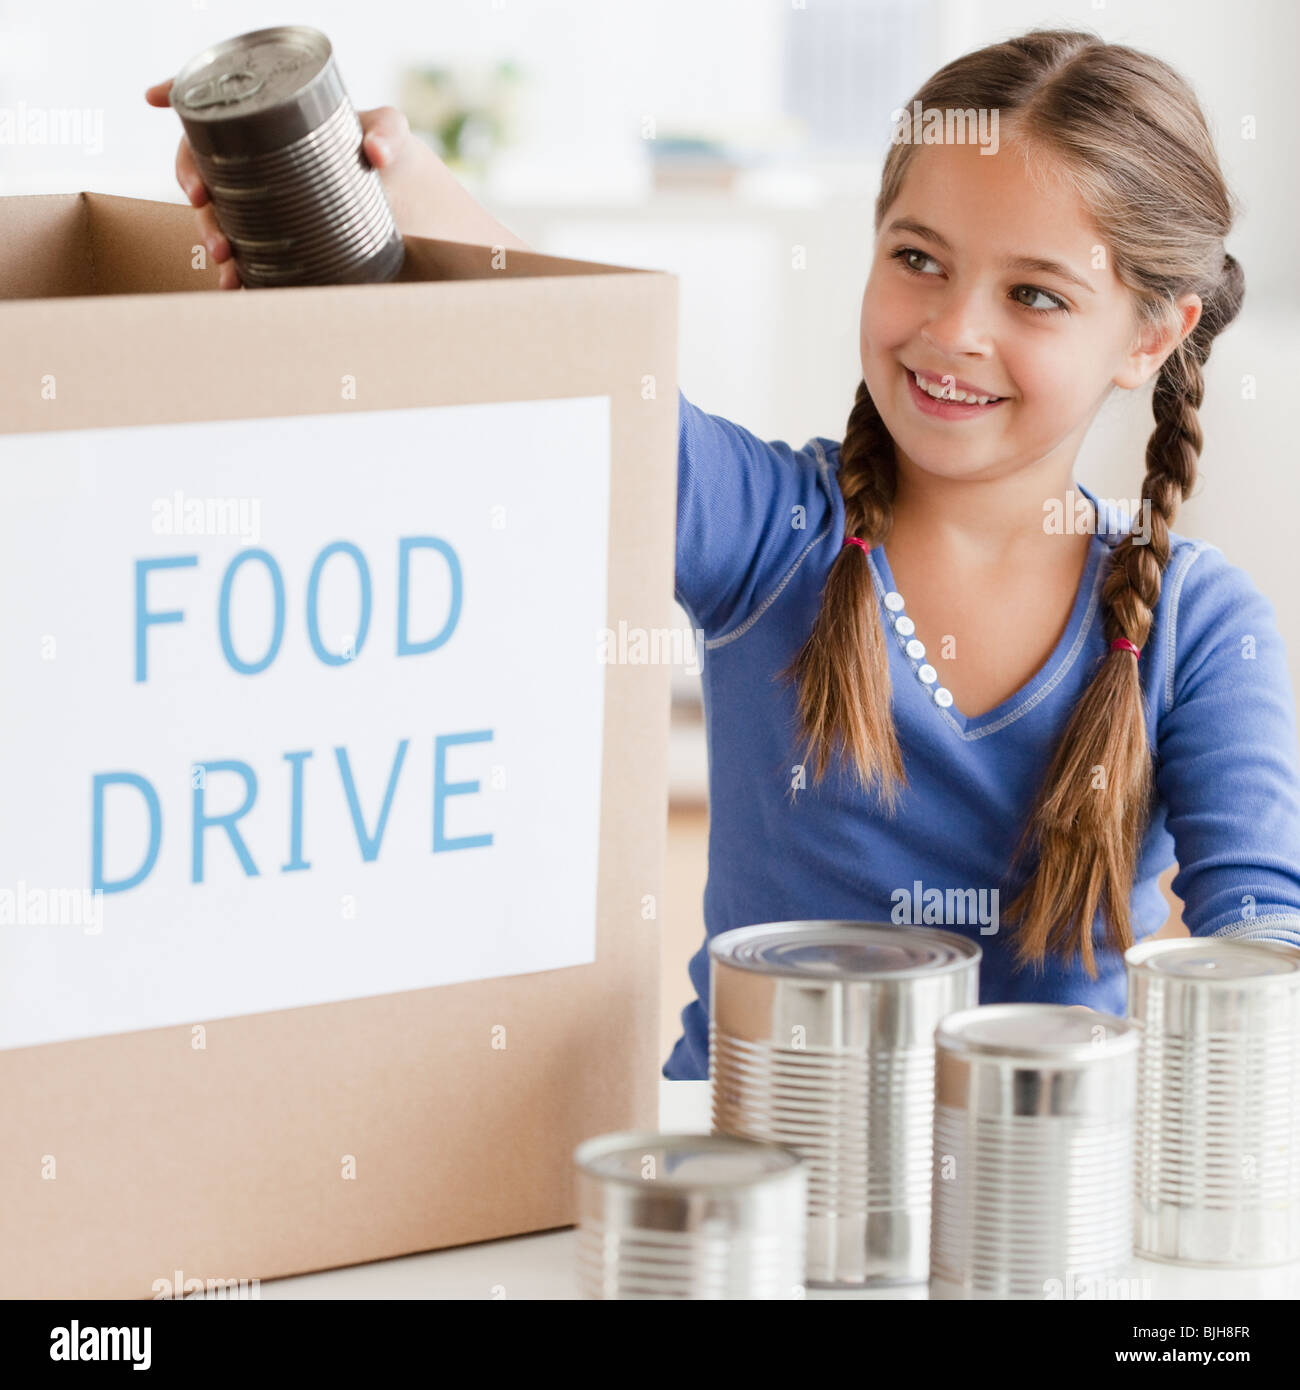 Food drive - Stock Image